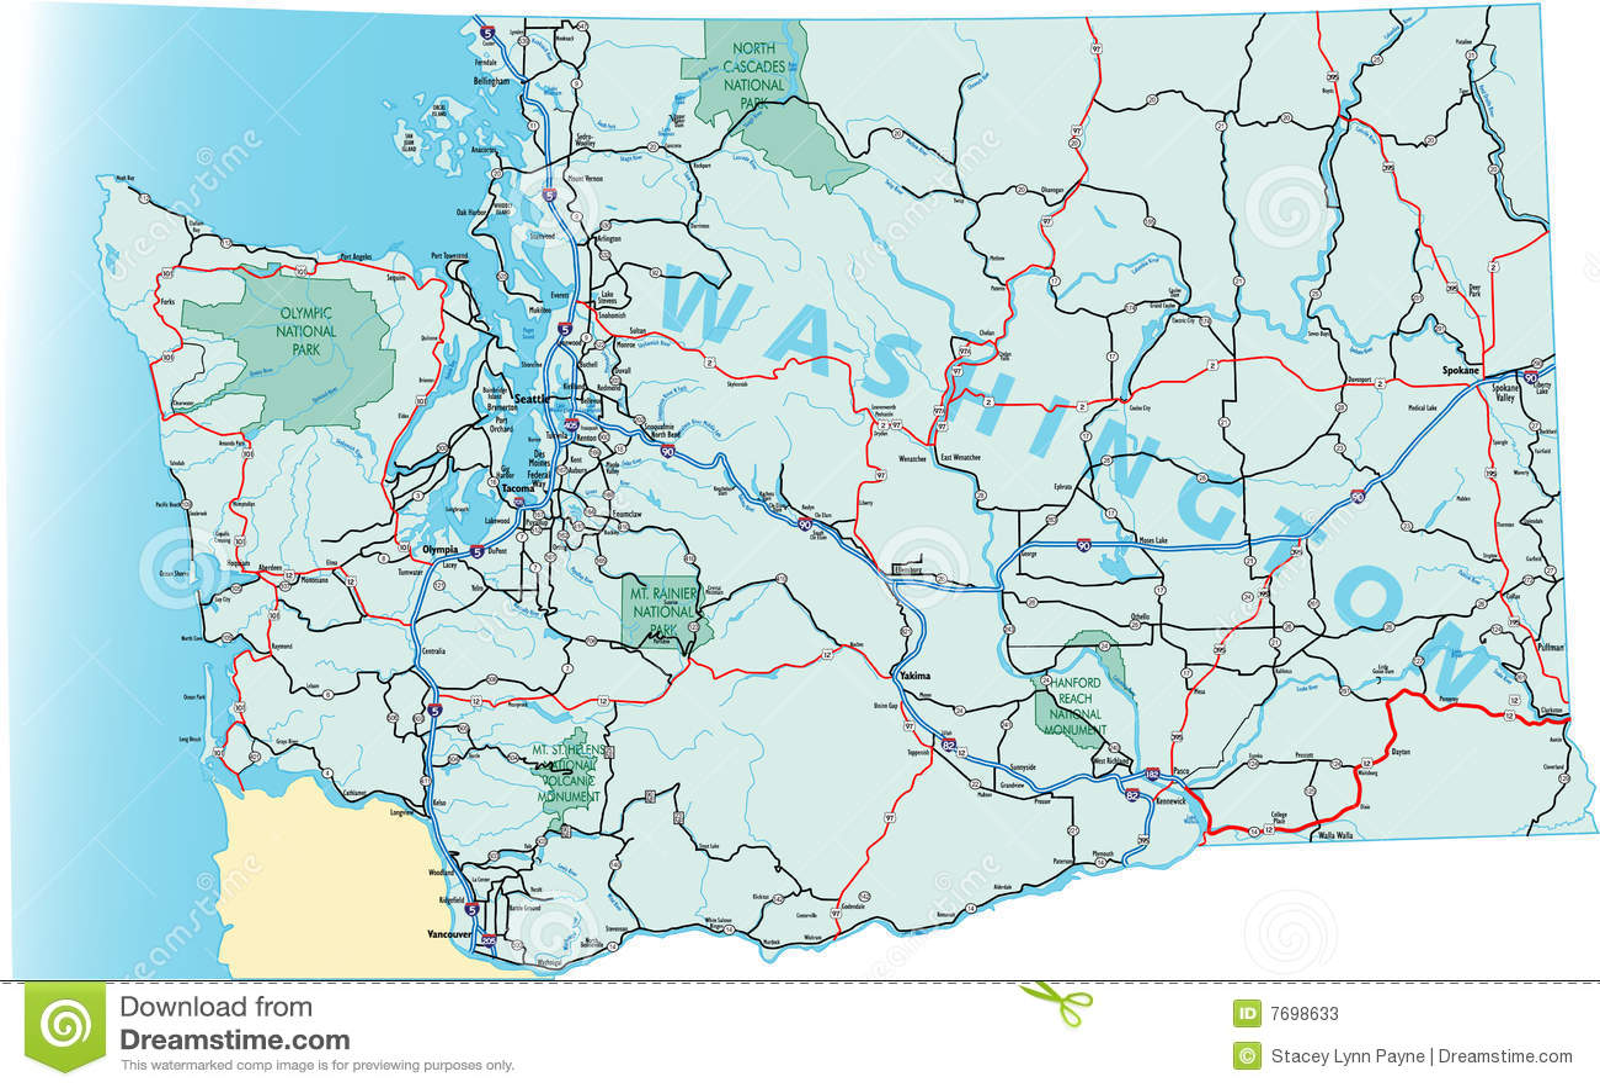 Washington State Road Map Stock Photos  Image 7698633